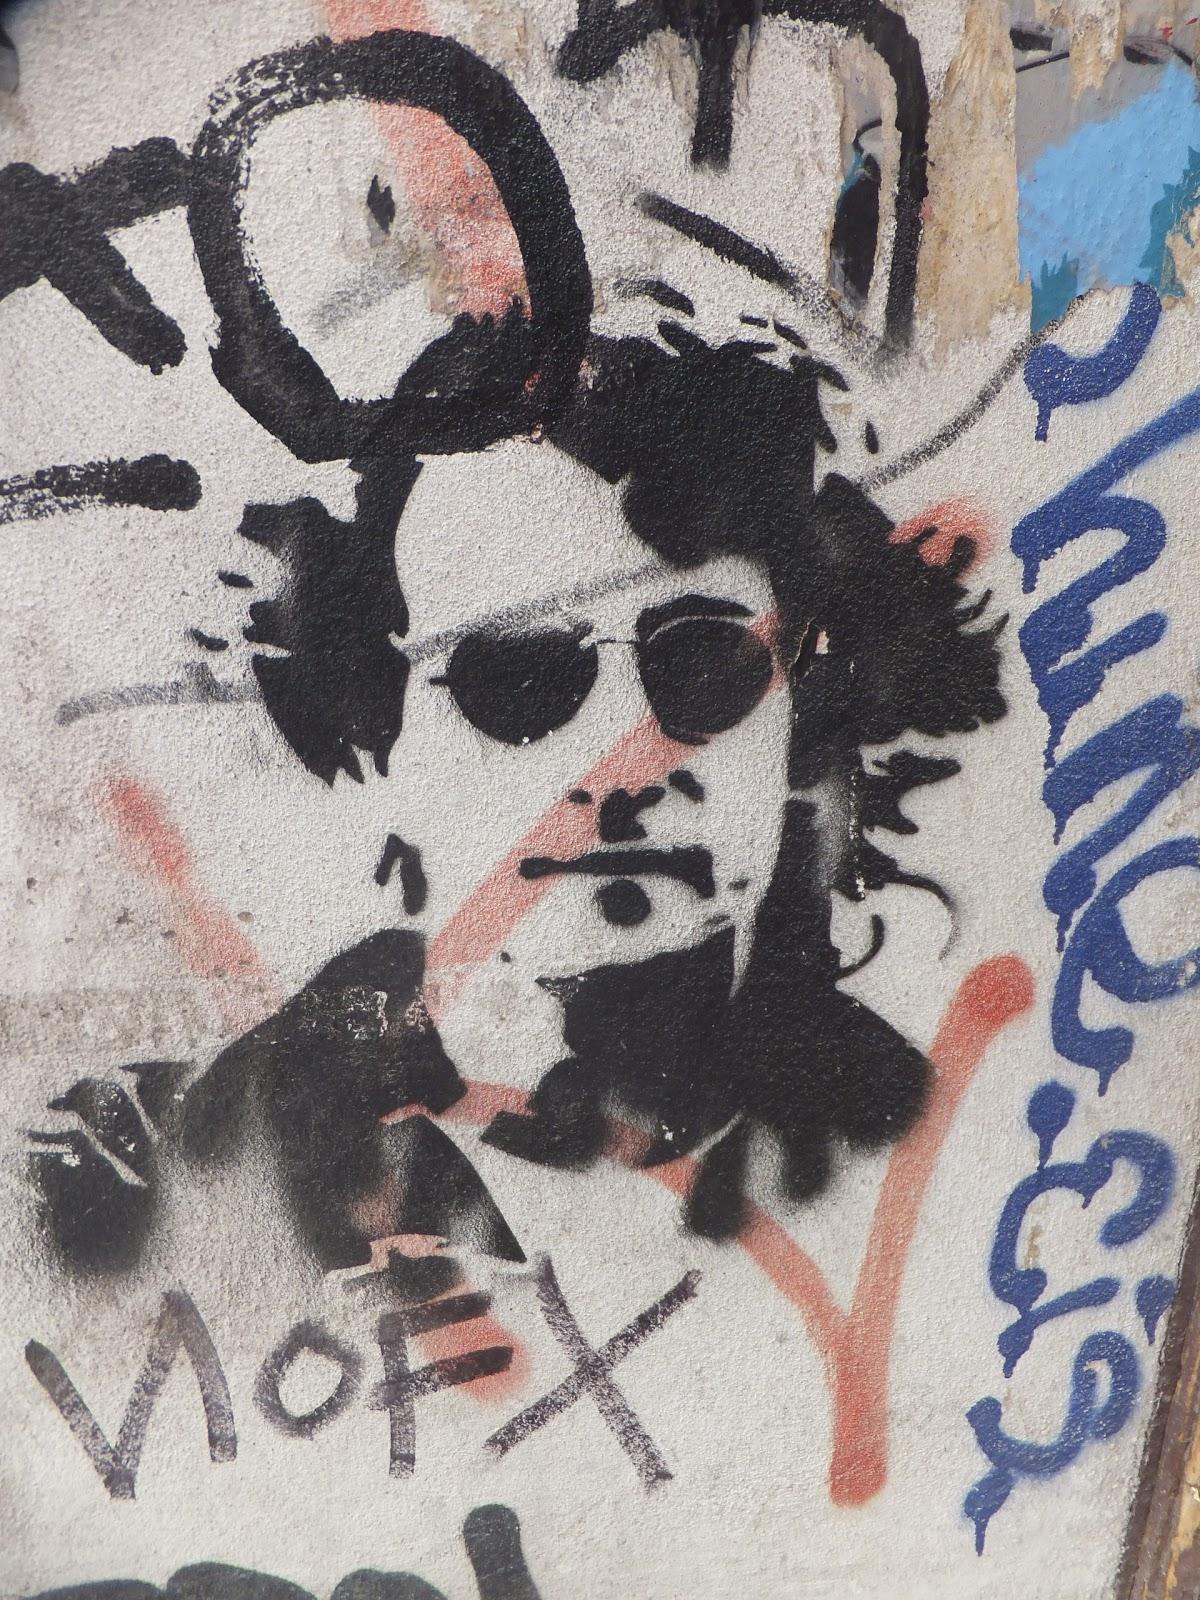 Street Art, Berlín, Elisa N, Blog de Viajes, Lifestyle, Travel